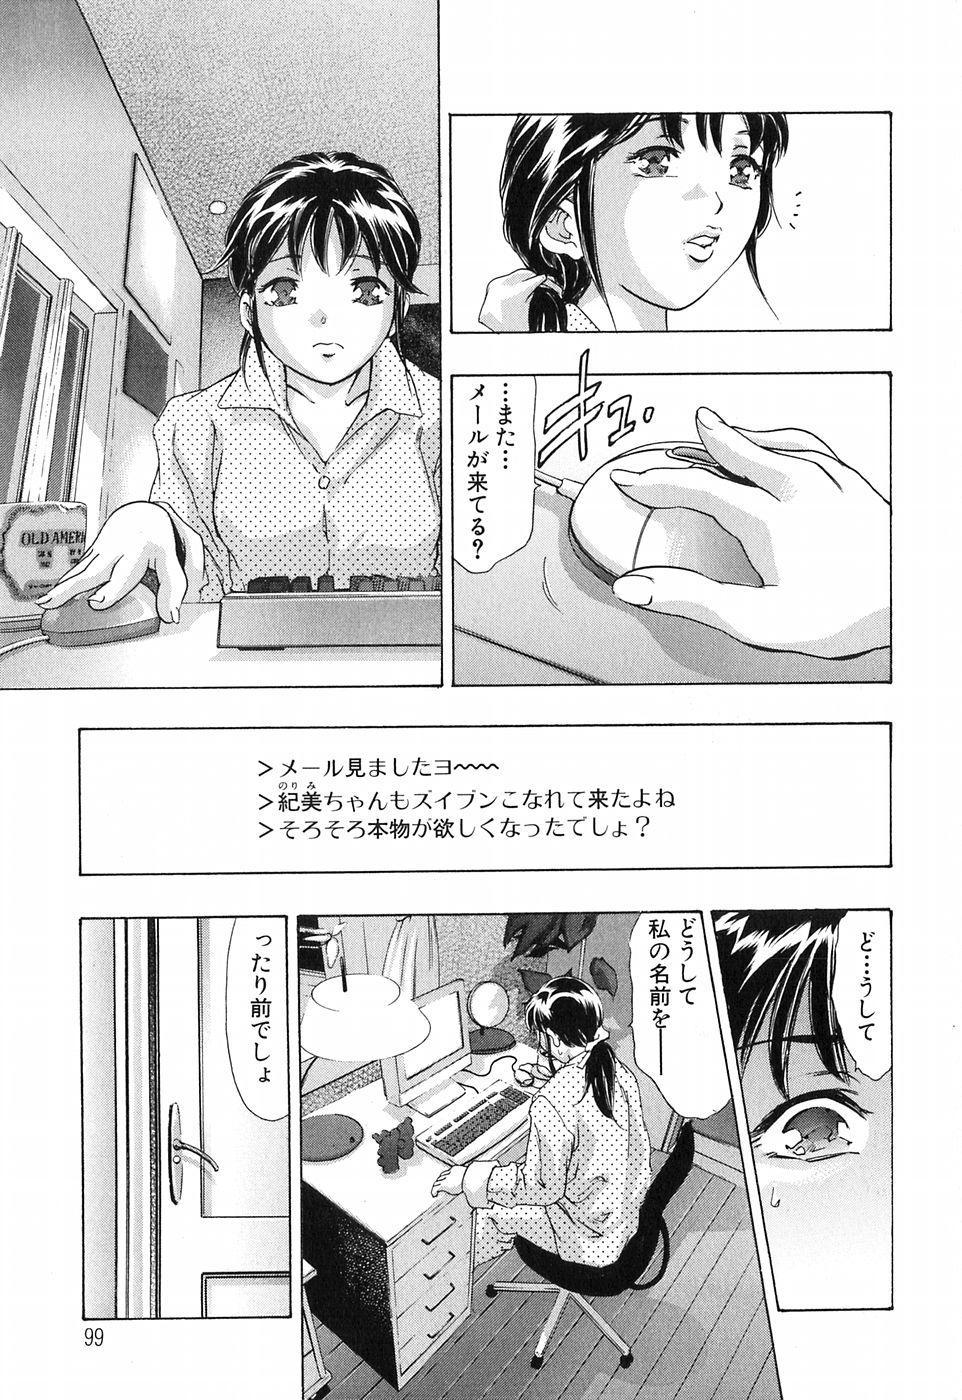 Uchi Naru Koe - Voice which becomes inside 98